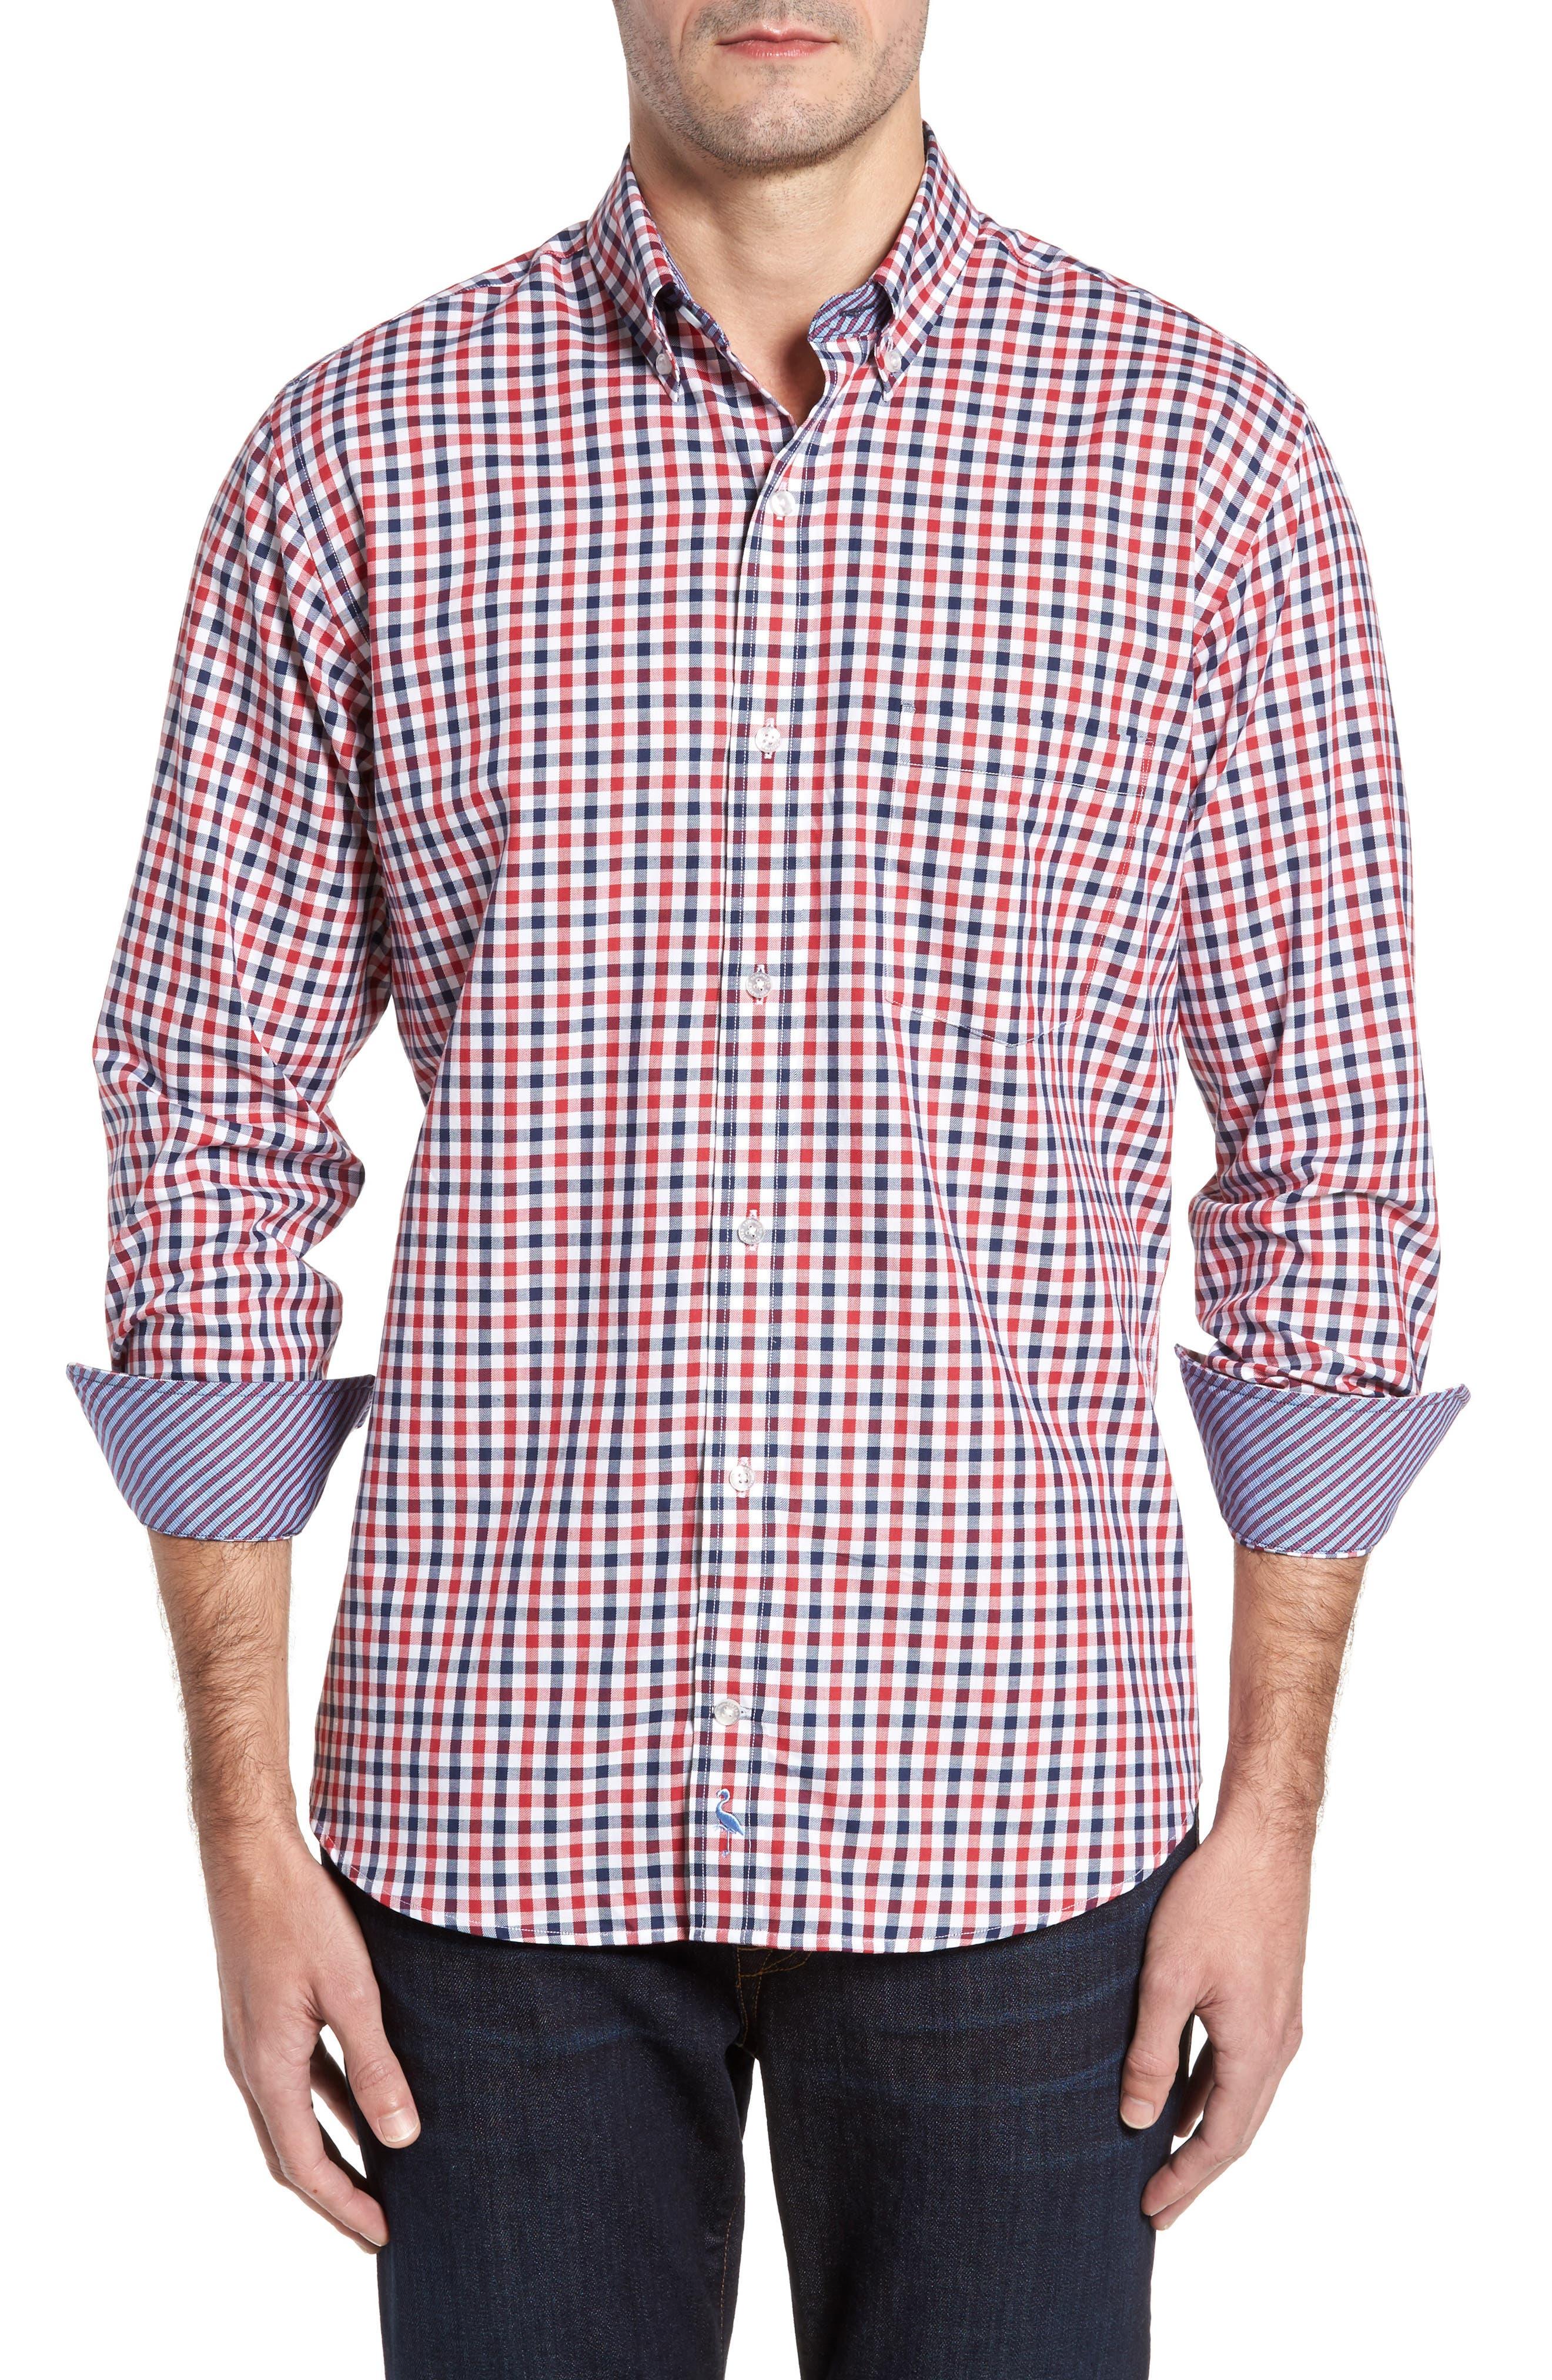 Alternate Image 1 Selected - TailorByrd Bernice Check Sport Shirt